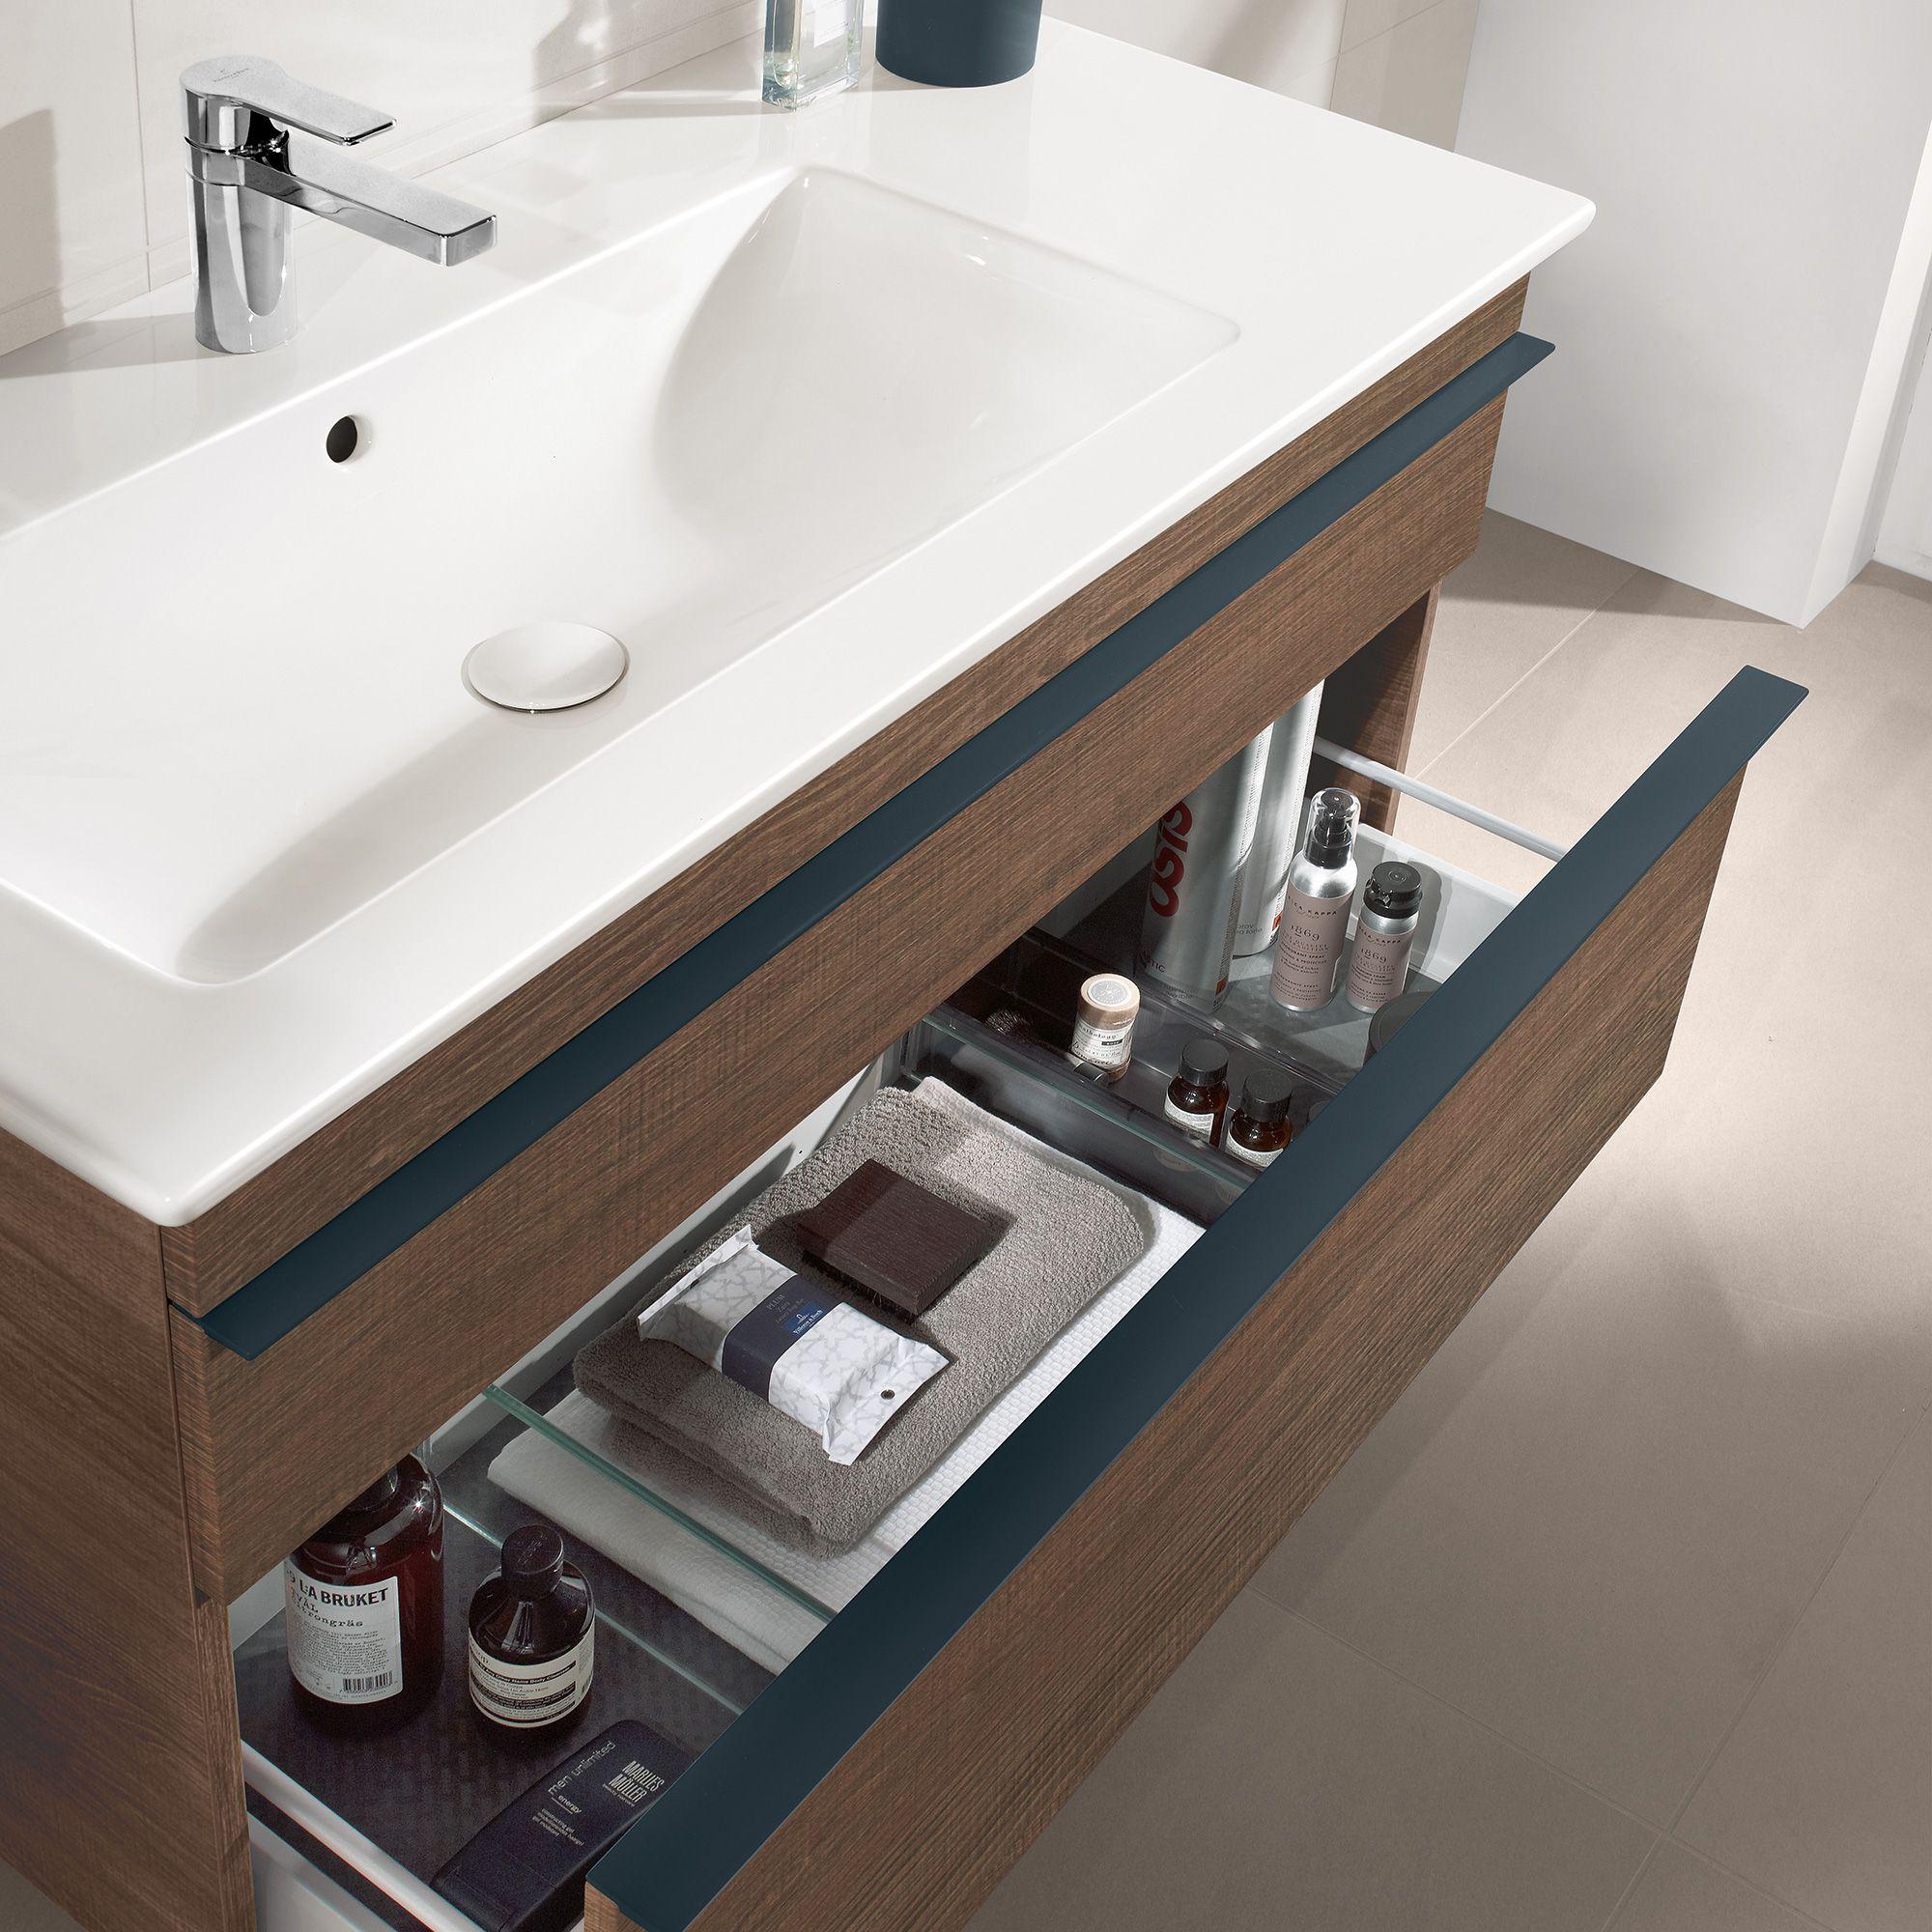 villeroy boch vanity unit venticello xxl santana oak 2 ba os pinterest vanity units and. Black Bedroom Furniture Sets. Home Design Ideas